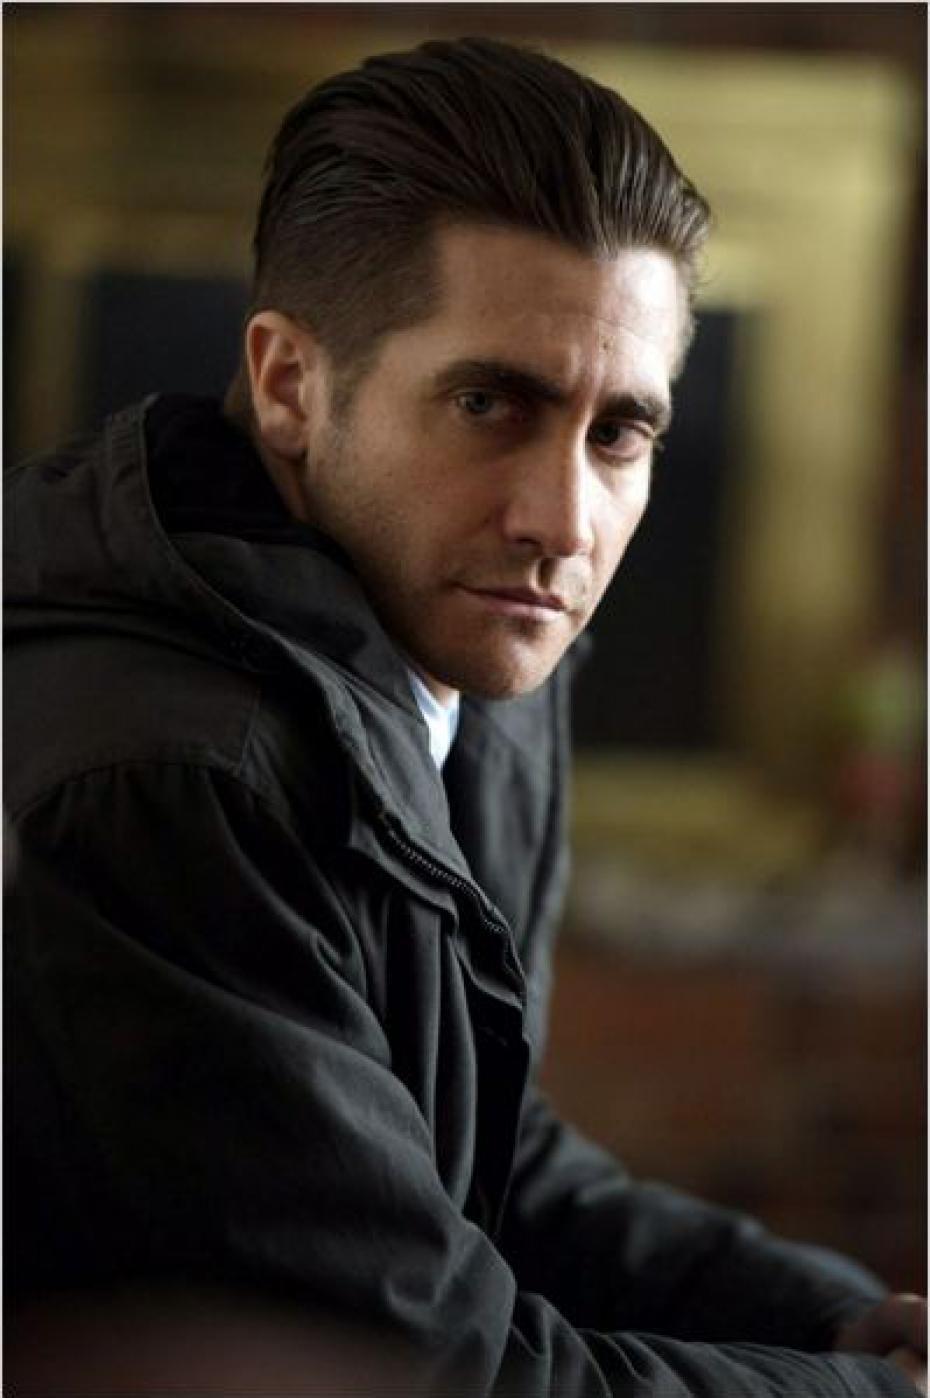 Jake Gyllenhaal Dans Prisoners Loubli Du Film My Crushes Ooo